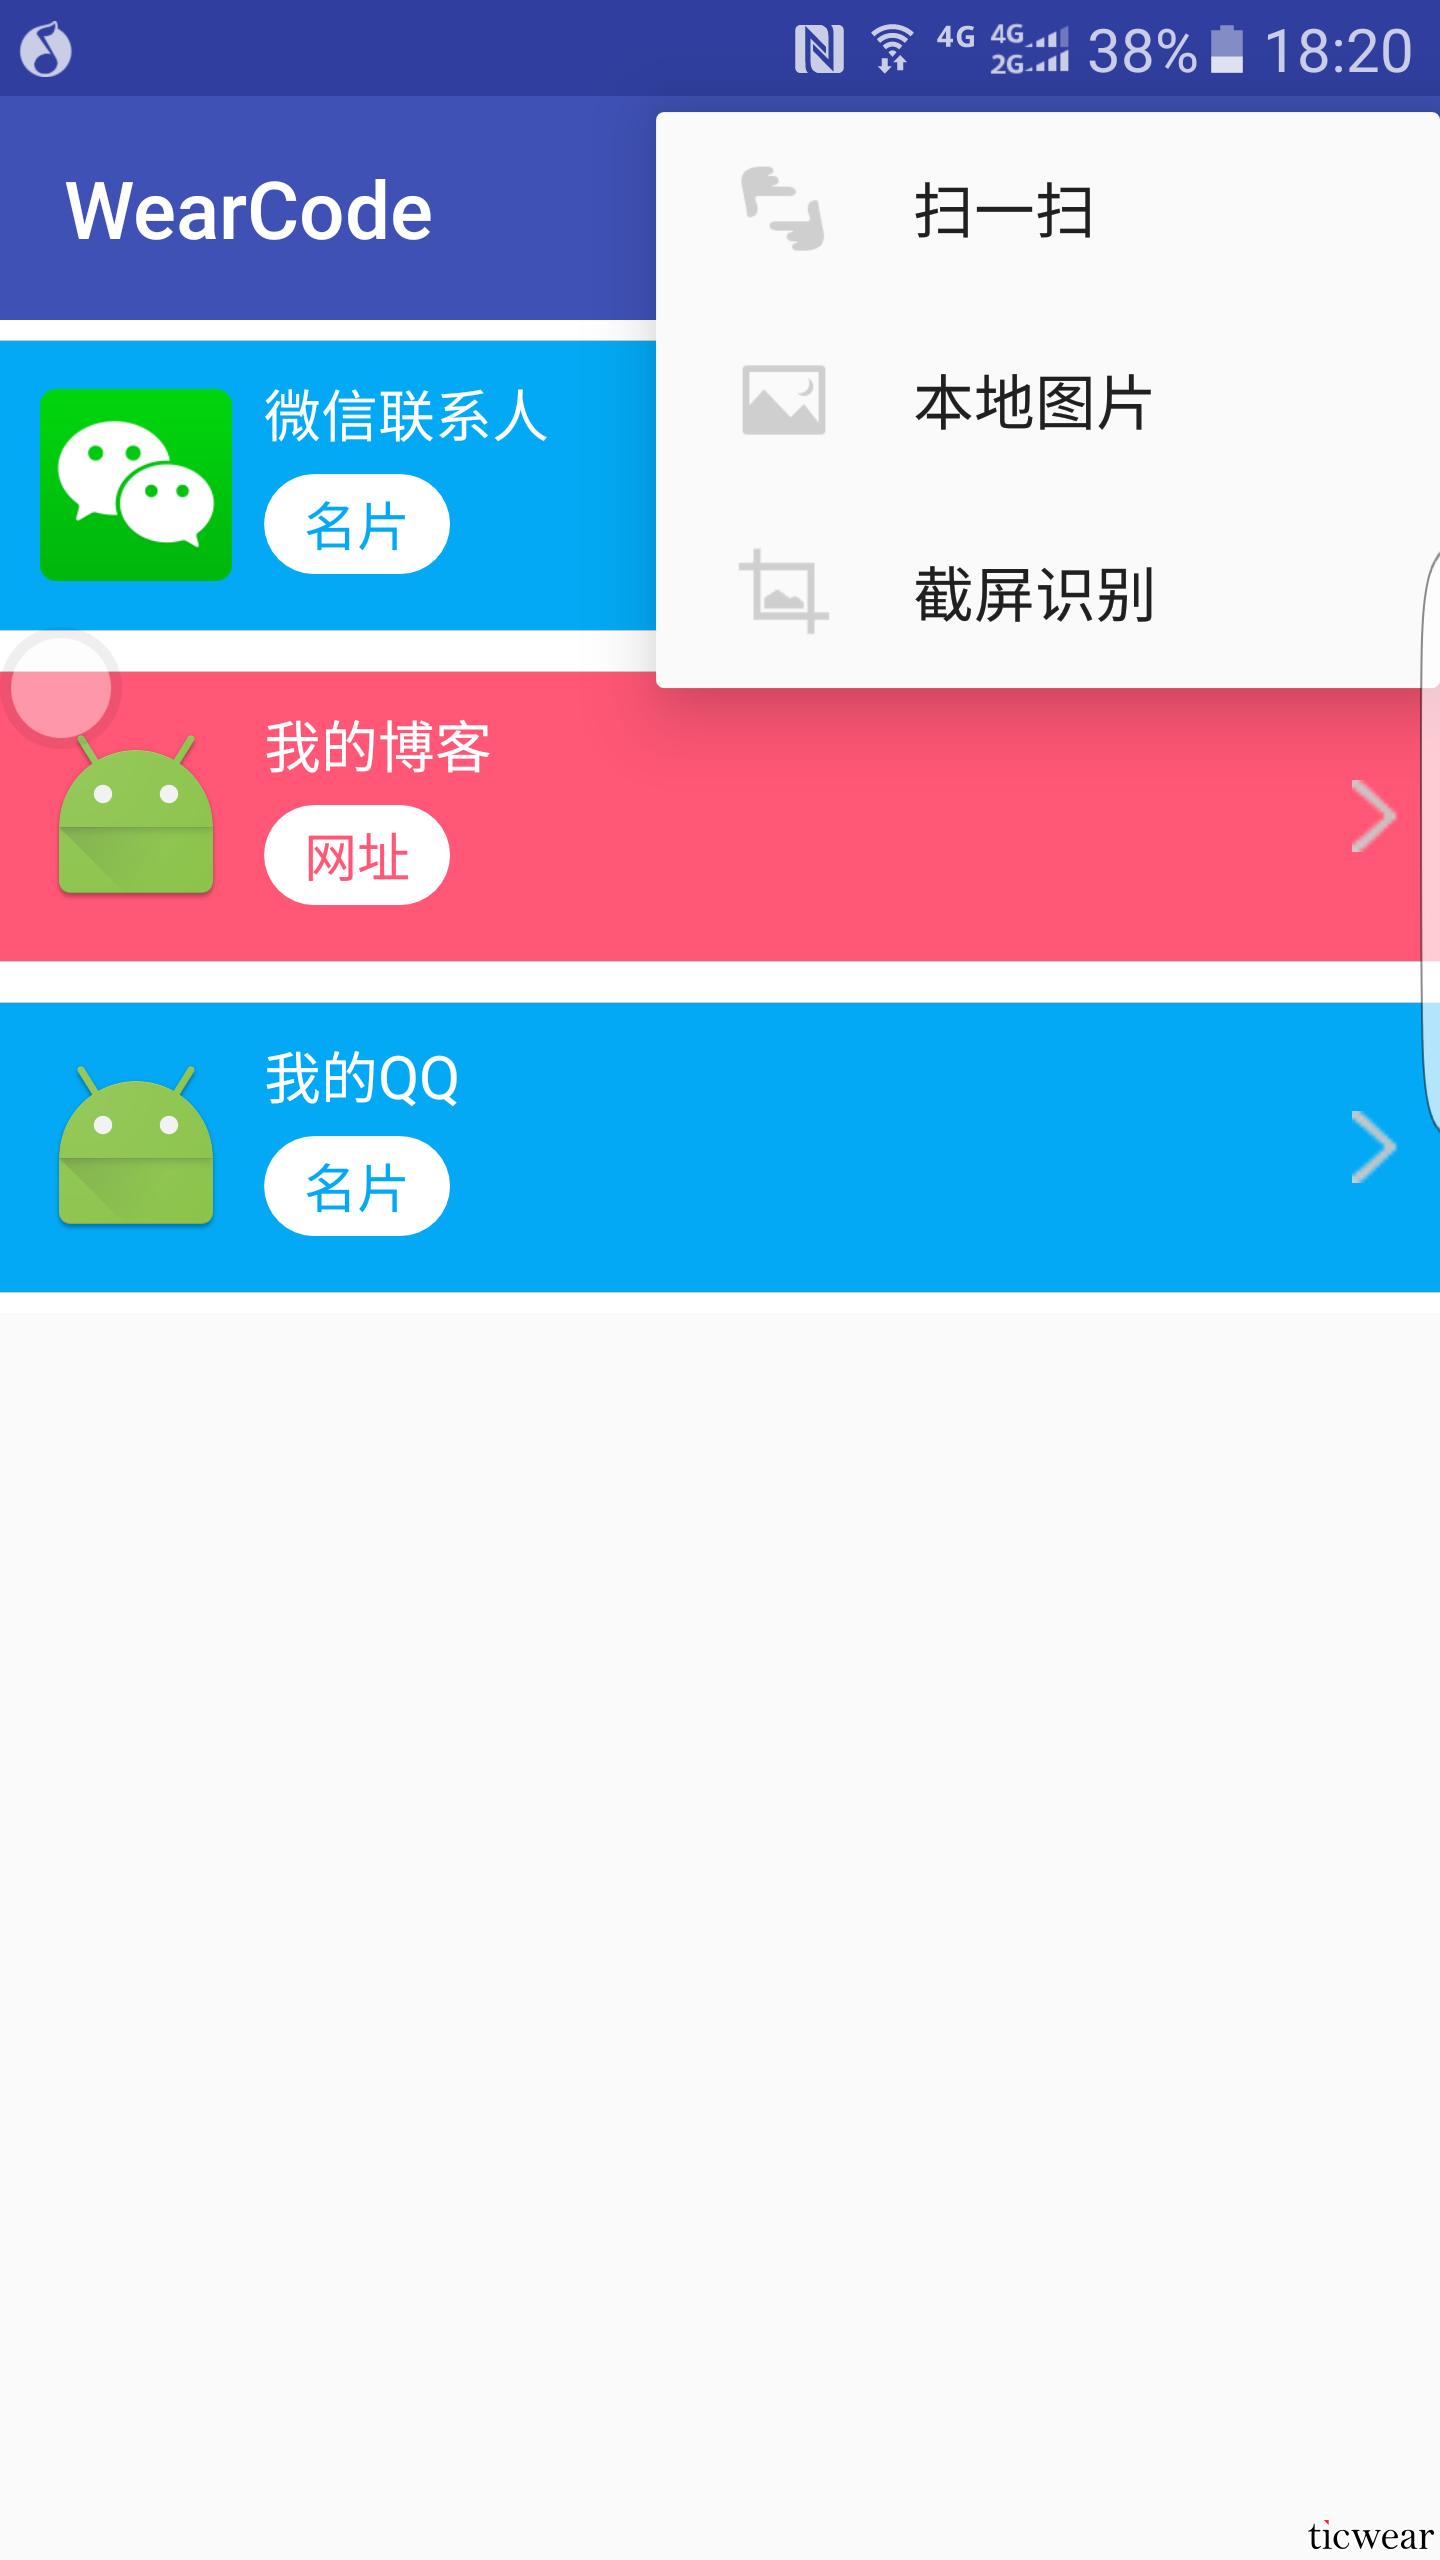 Screenshot_20160803-182057.png